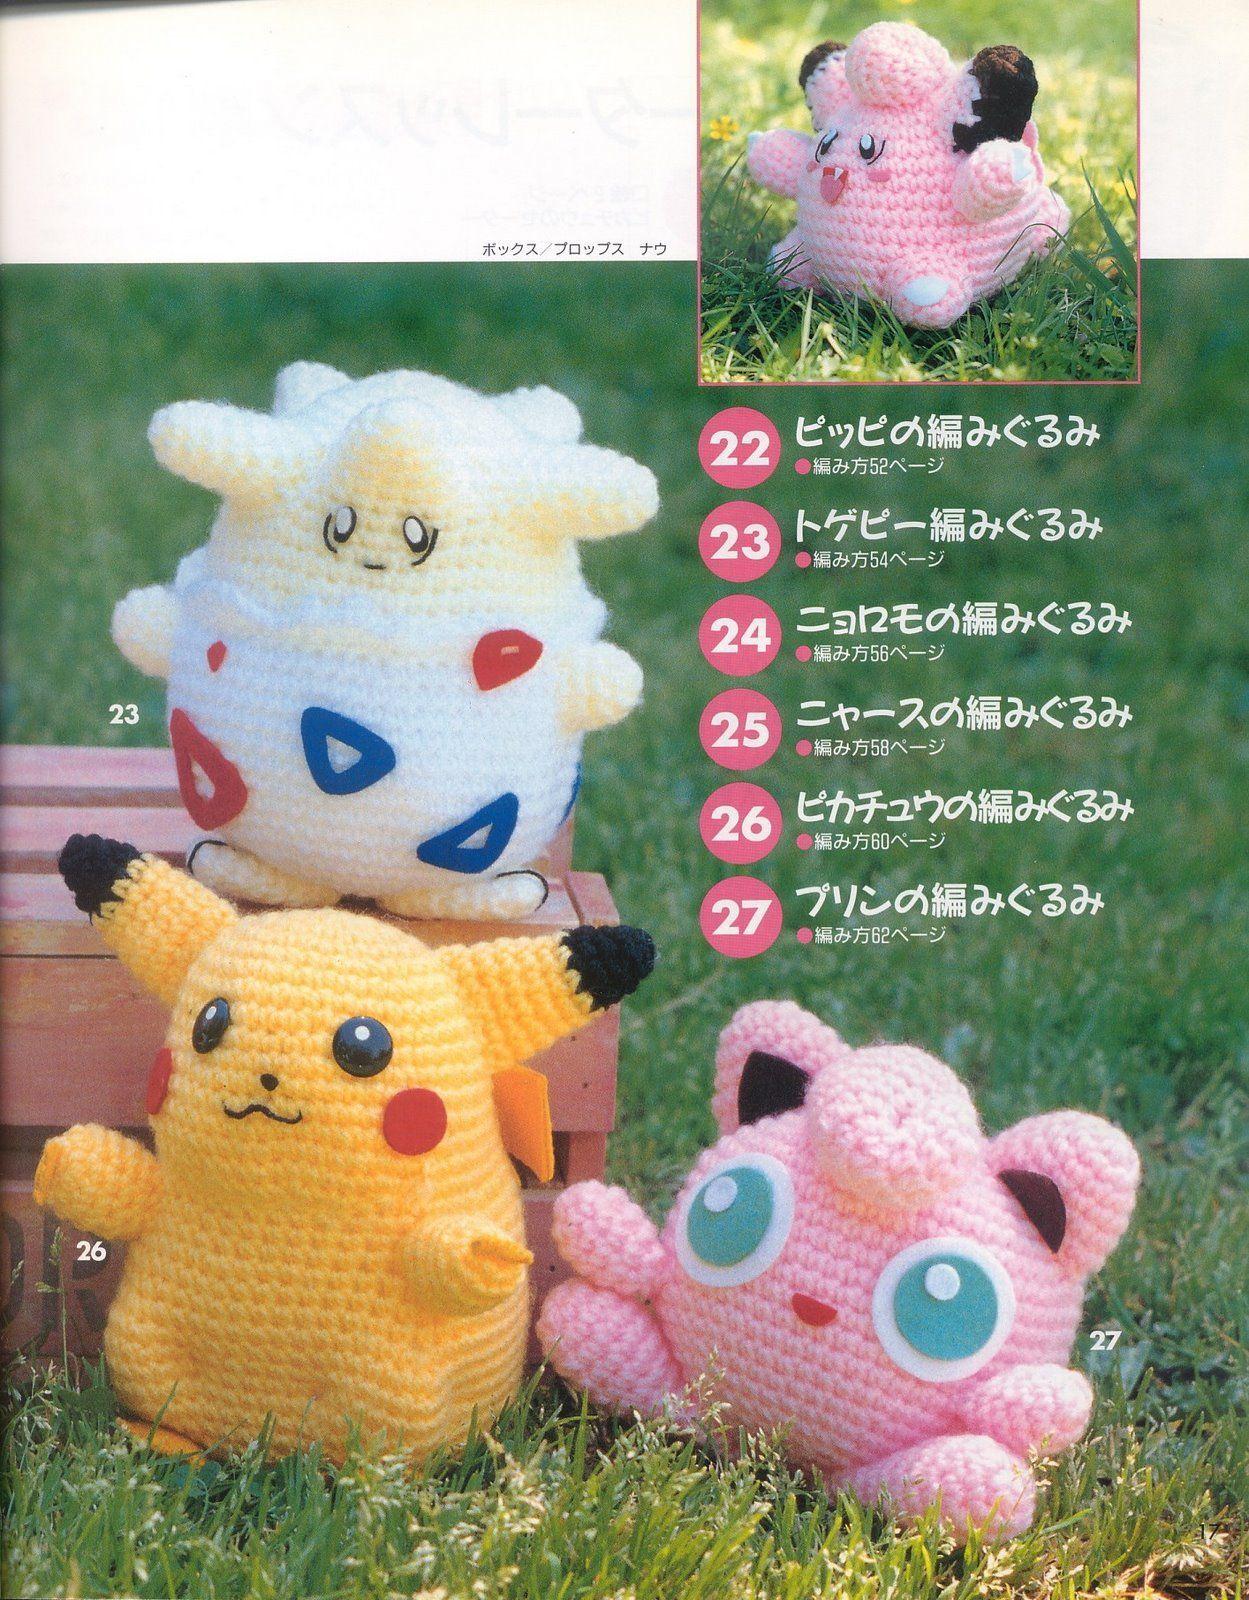 Pokemon Characters Amigurumi - Free Japanese Pattern | crochet ...